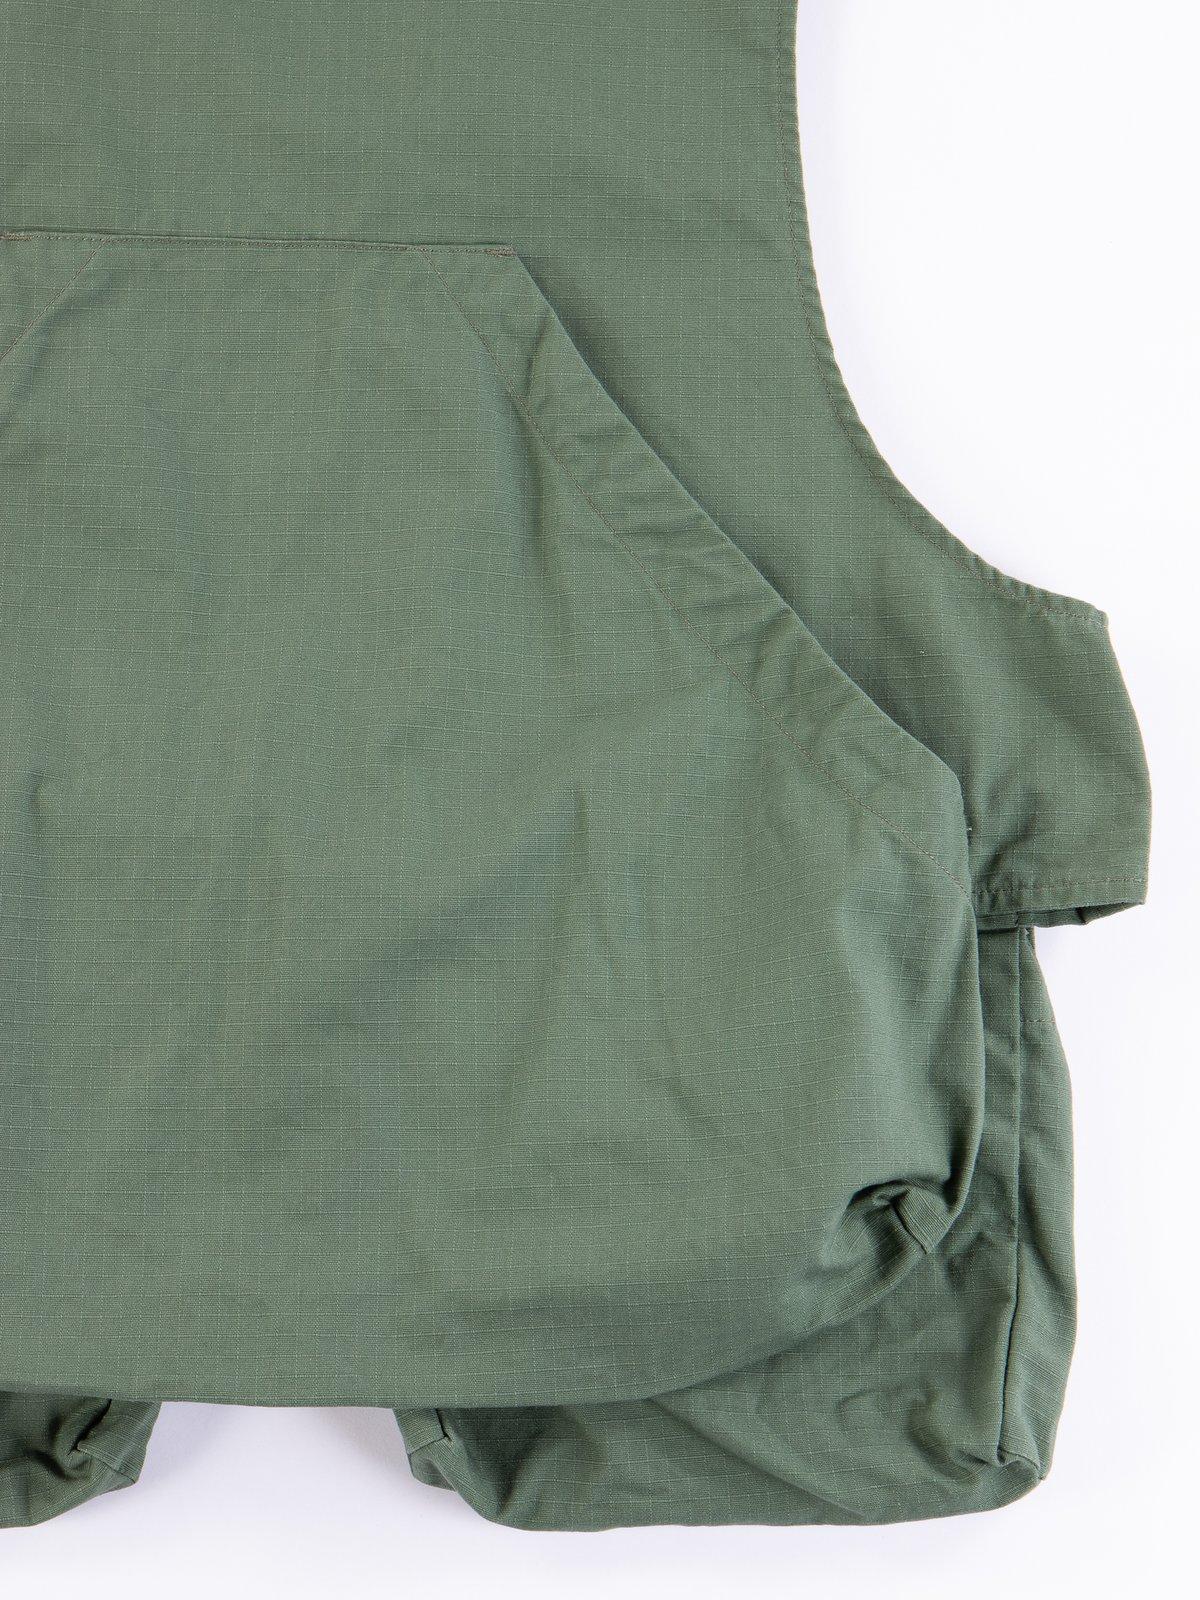 Olive Cotton Ripstop Fowl Vest - Image 6